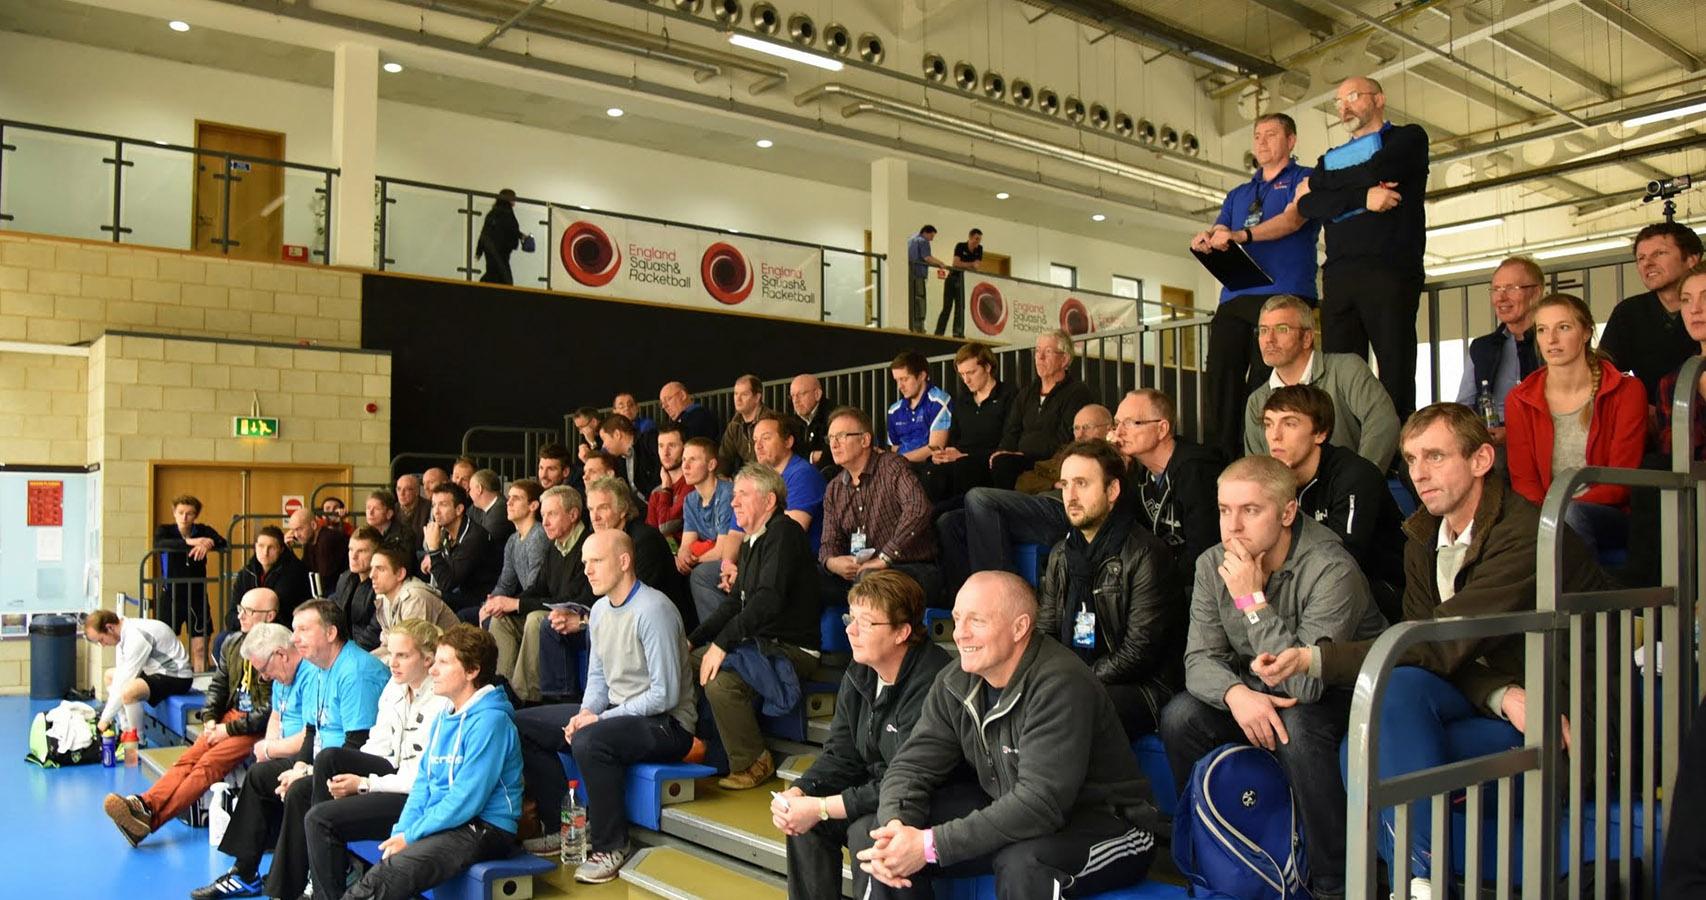 Referees at the National Squash Championships